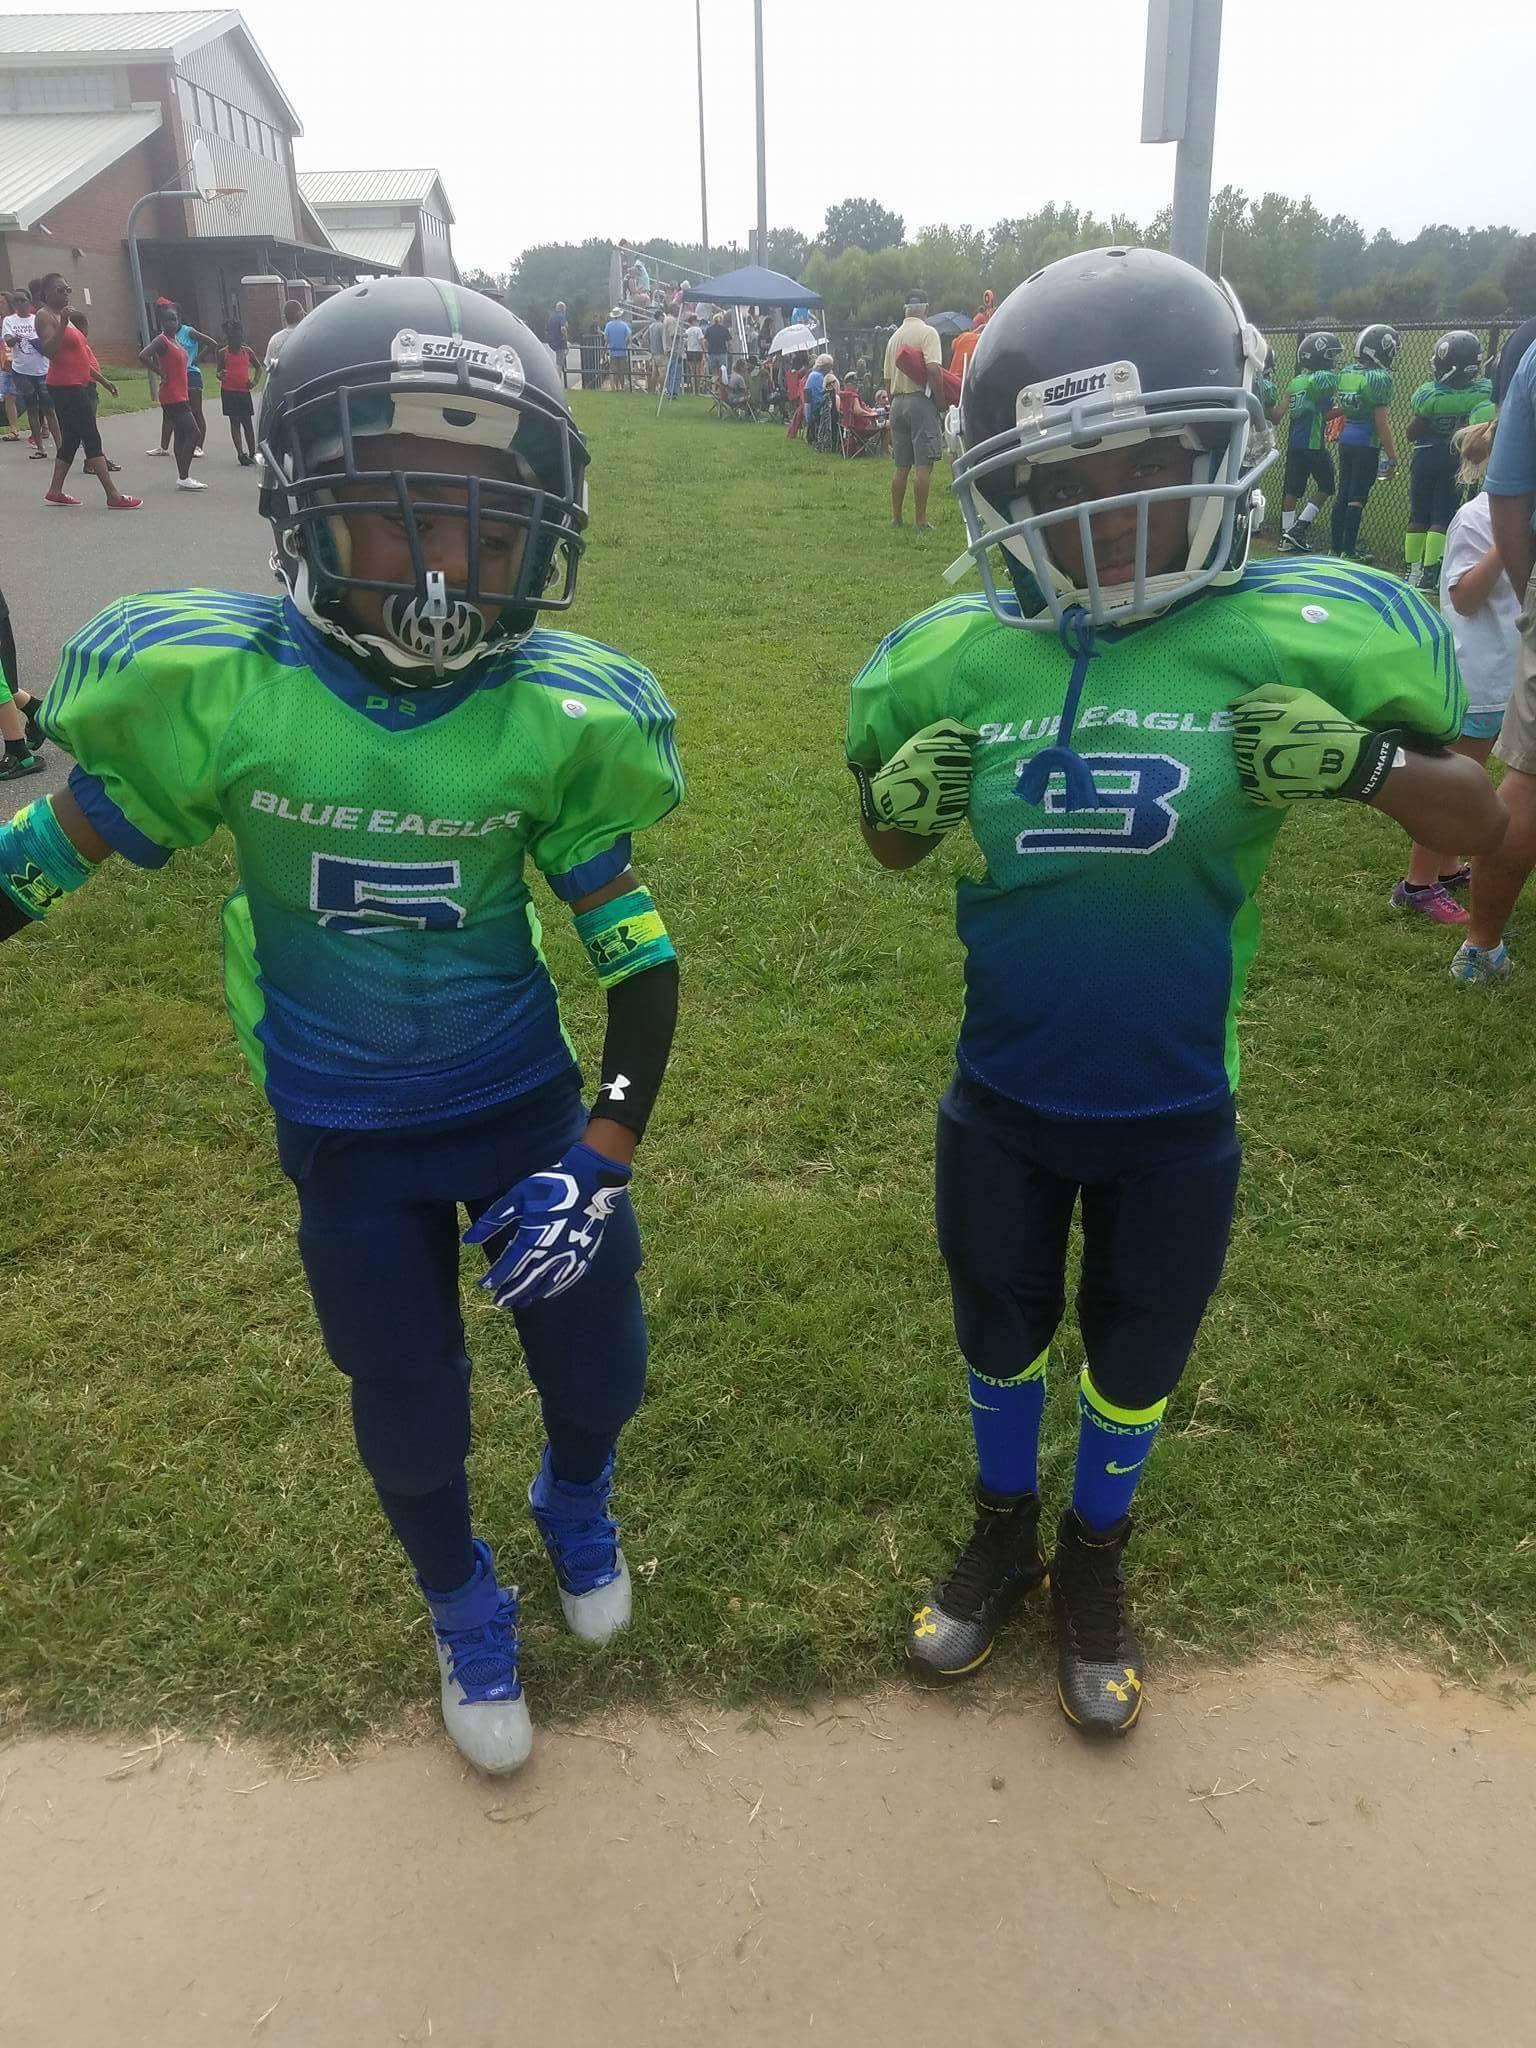 Blue light green New HD uniform jerseys shirts and pants